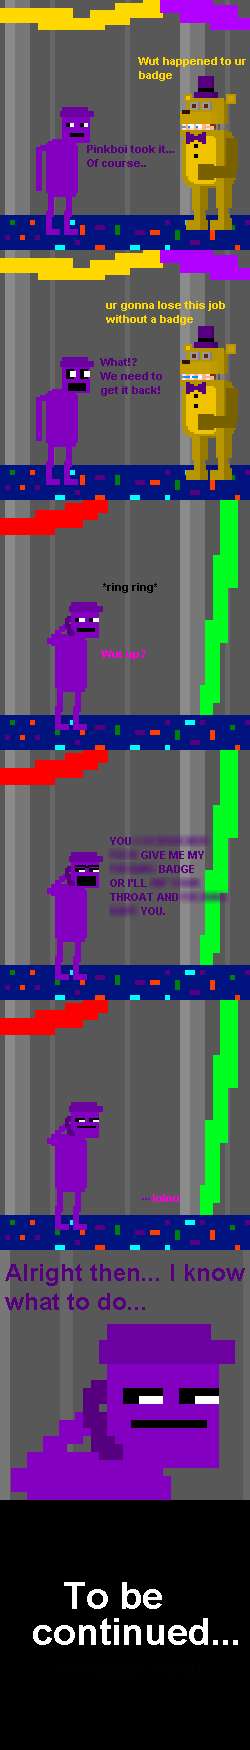 Purpleboi #9 - The Badge by PurpleBoiComics